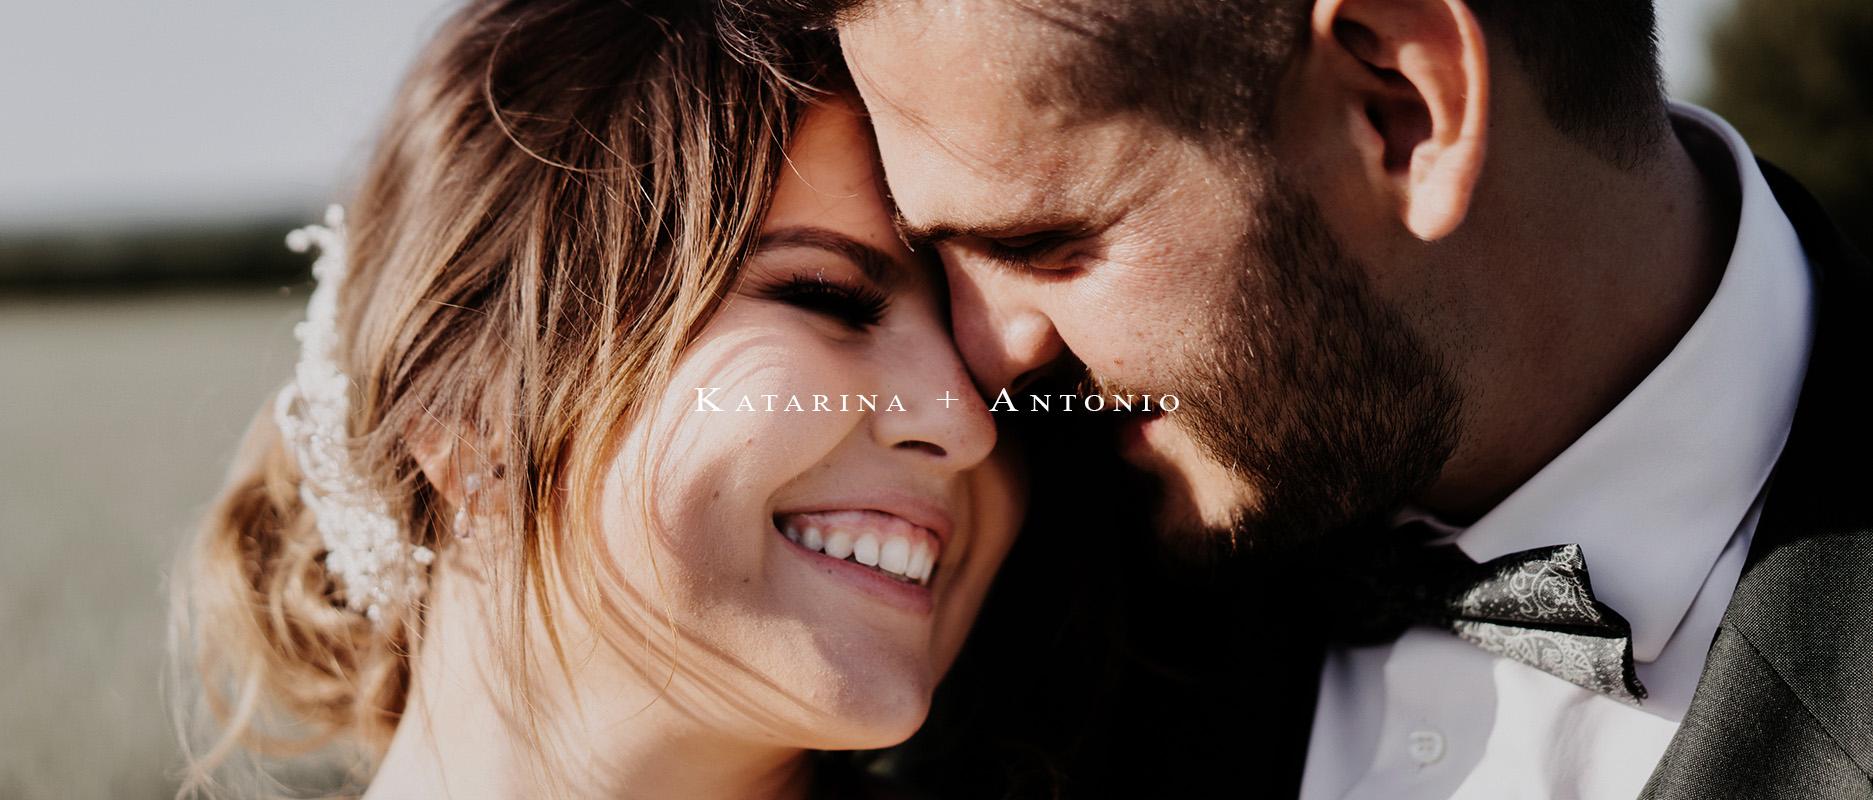 Katarina + Antonio | Austria, Austria | Schloss Raggendorf